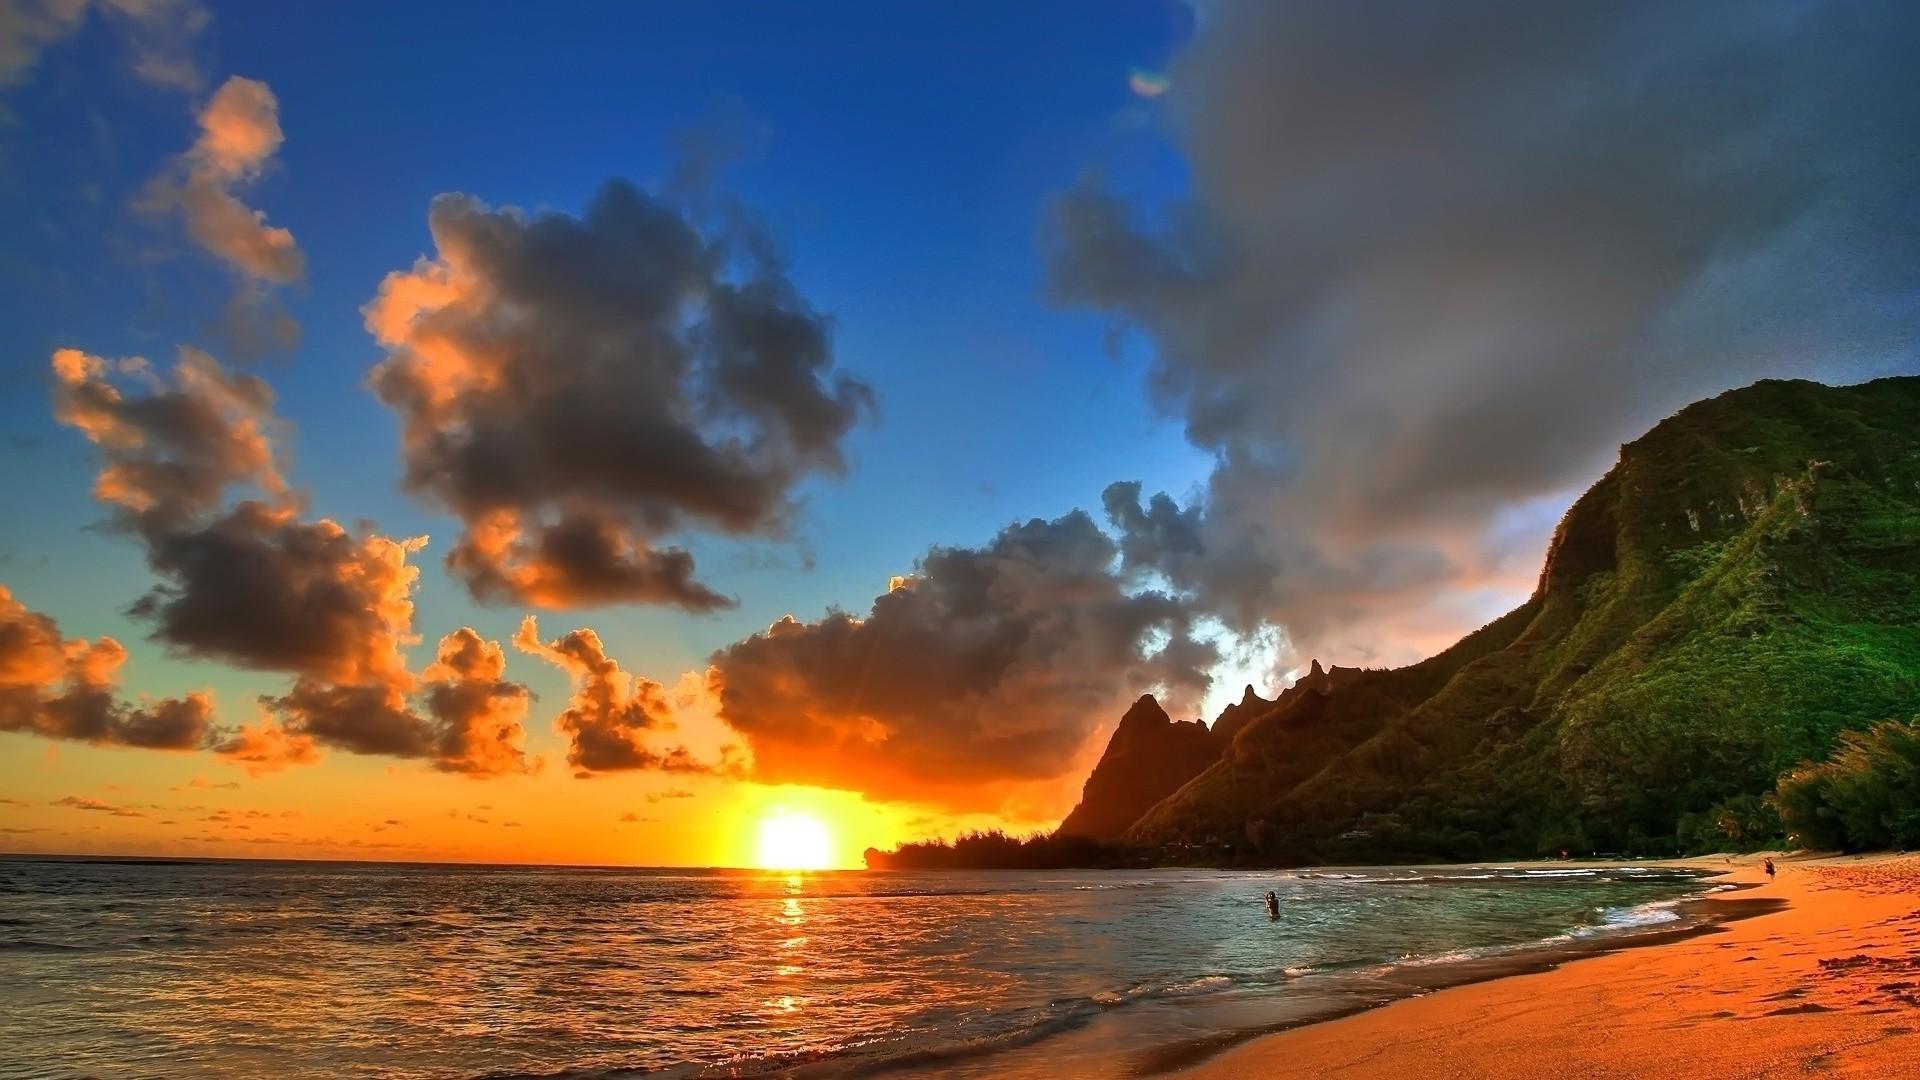 Wallpapers Beach Sunset 1080p For Desktop High Definition Wallpapers .